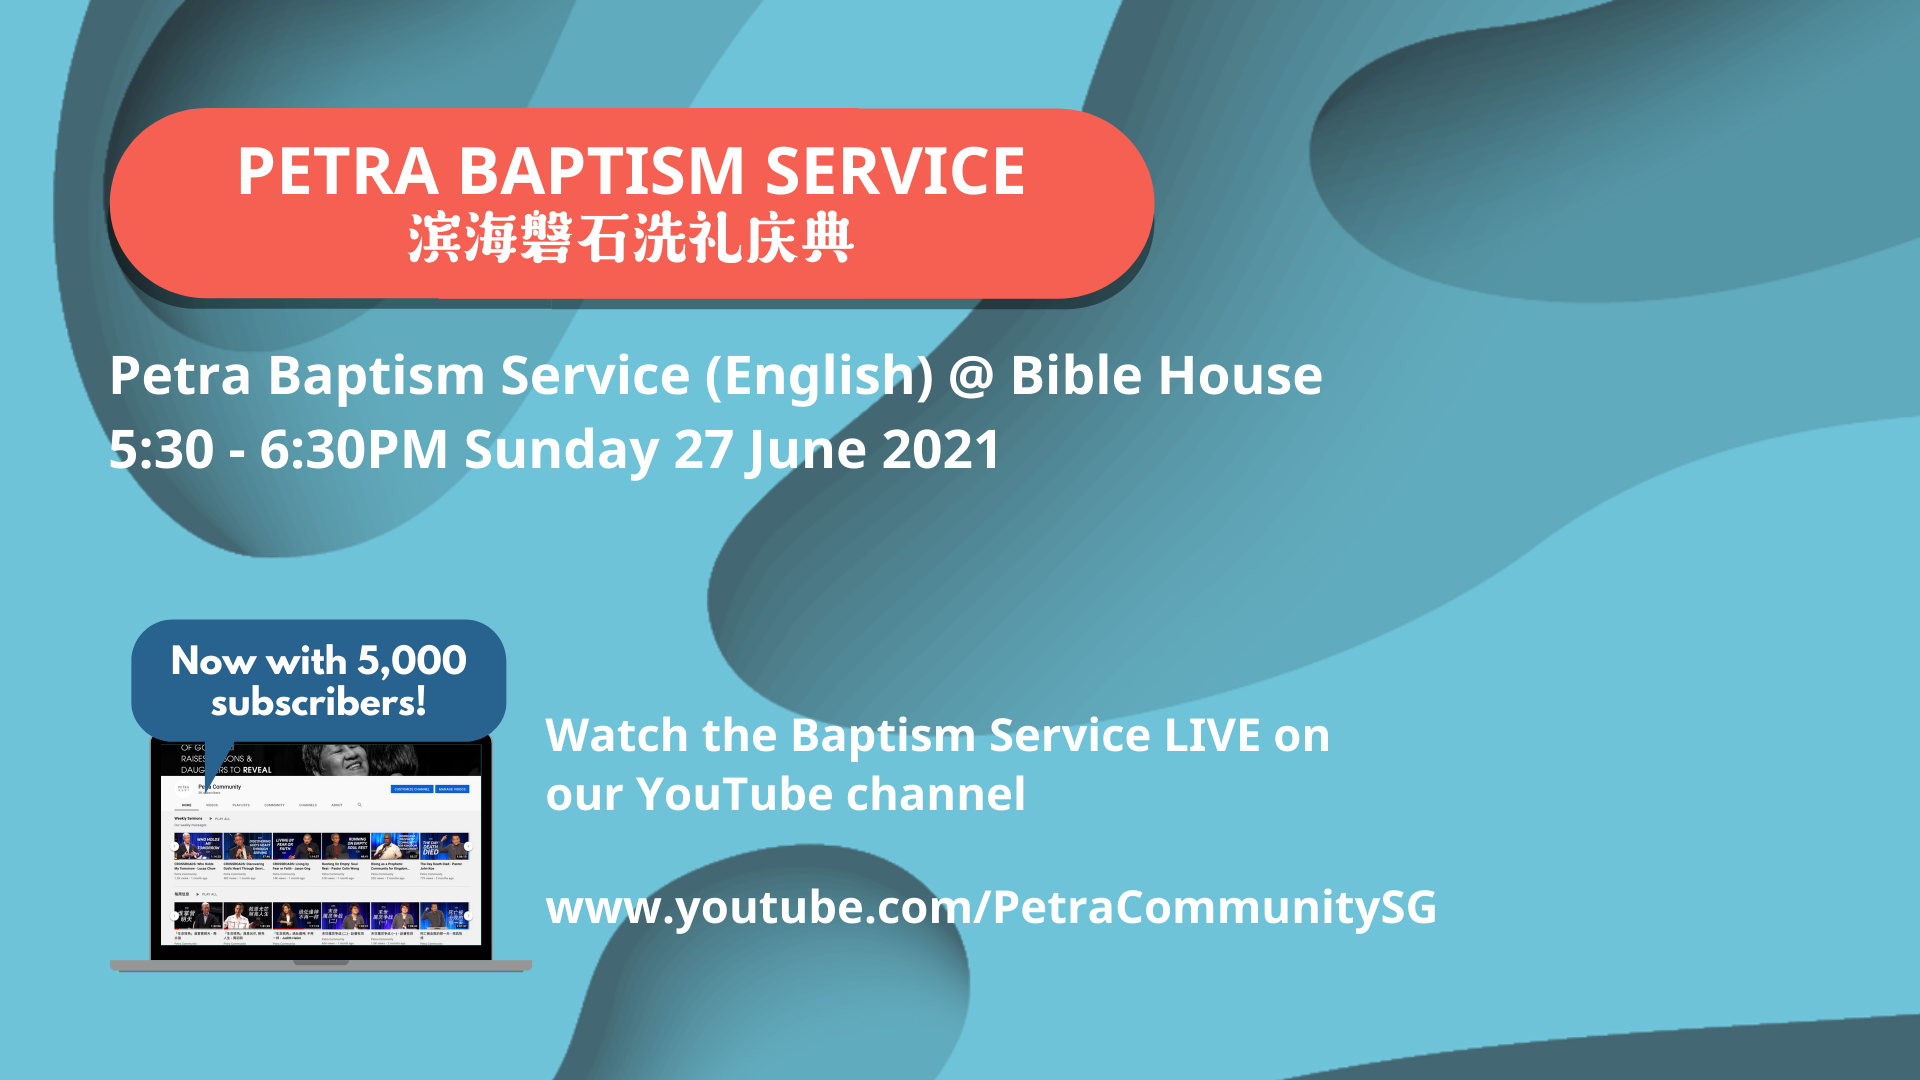 Petra Baptism 17 June Service Annc - ENG